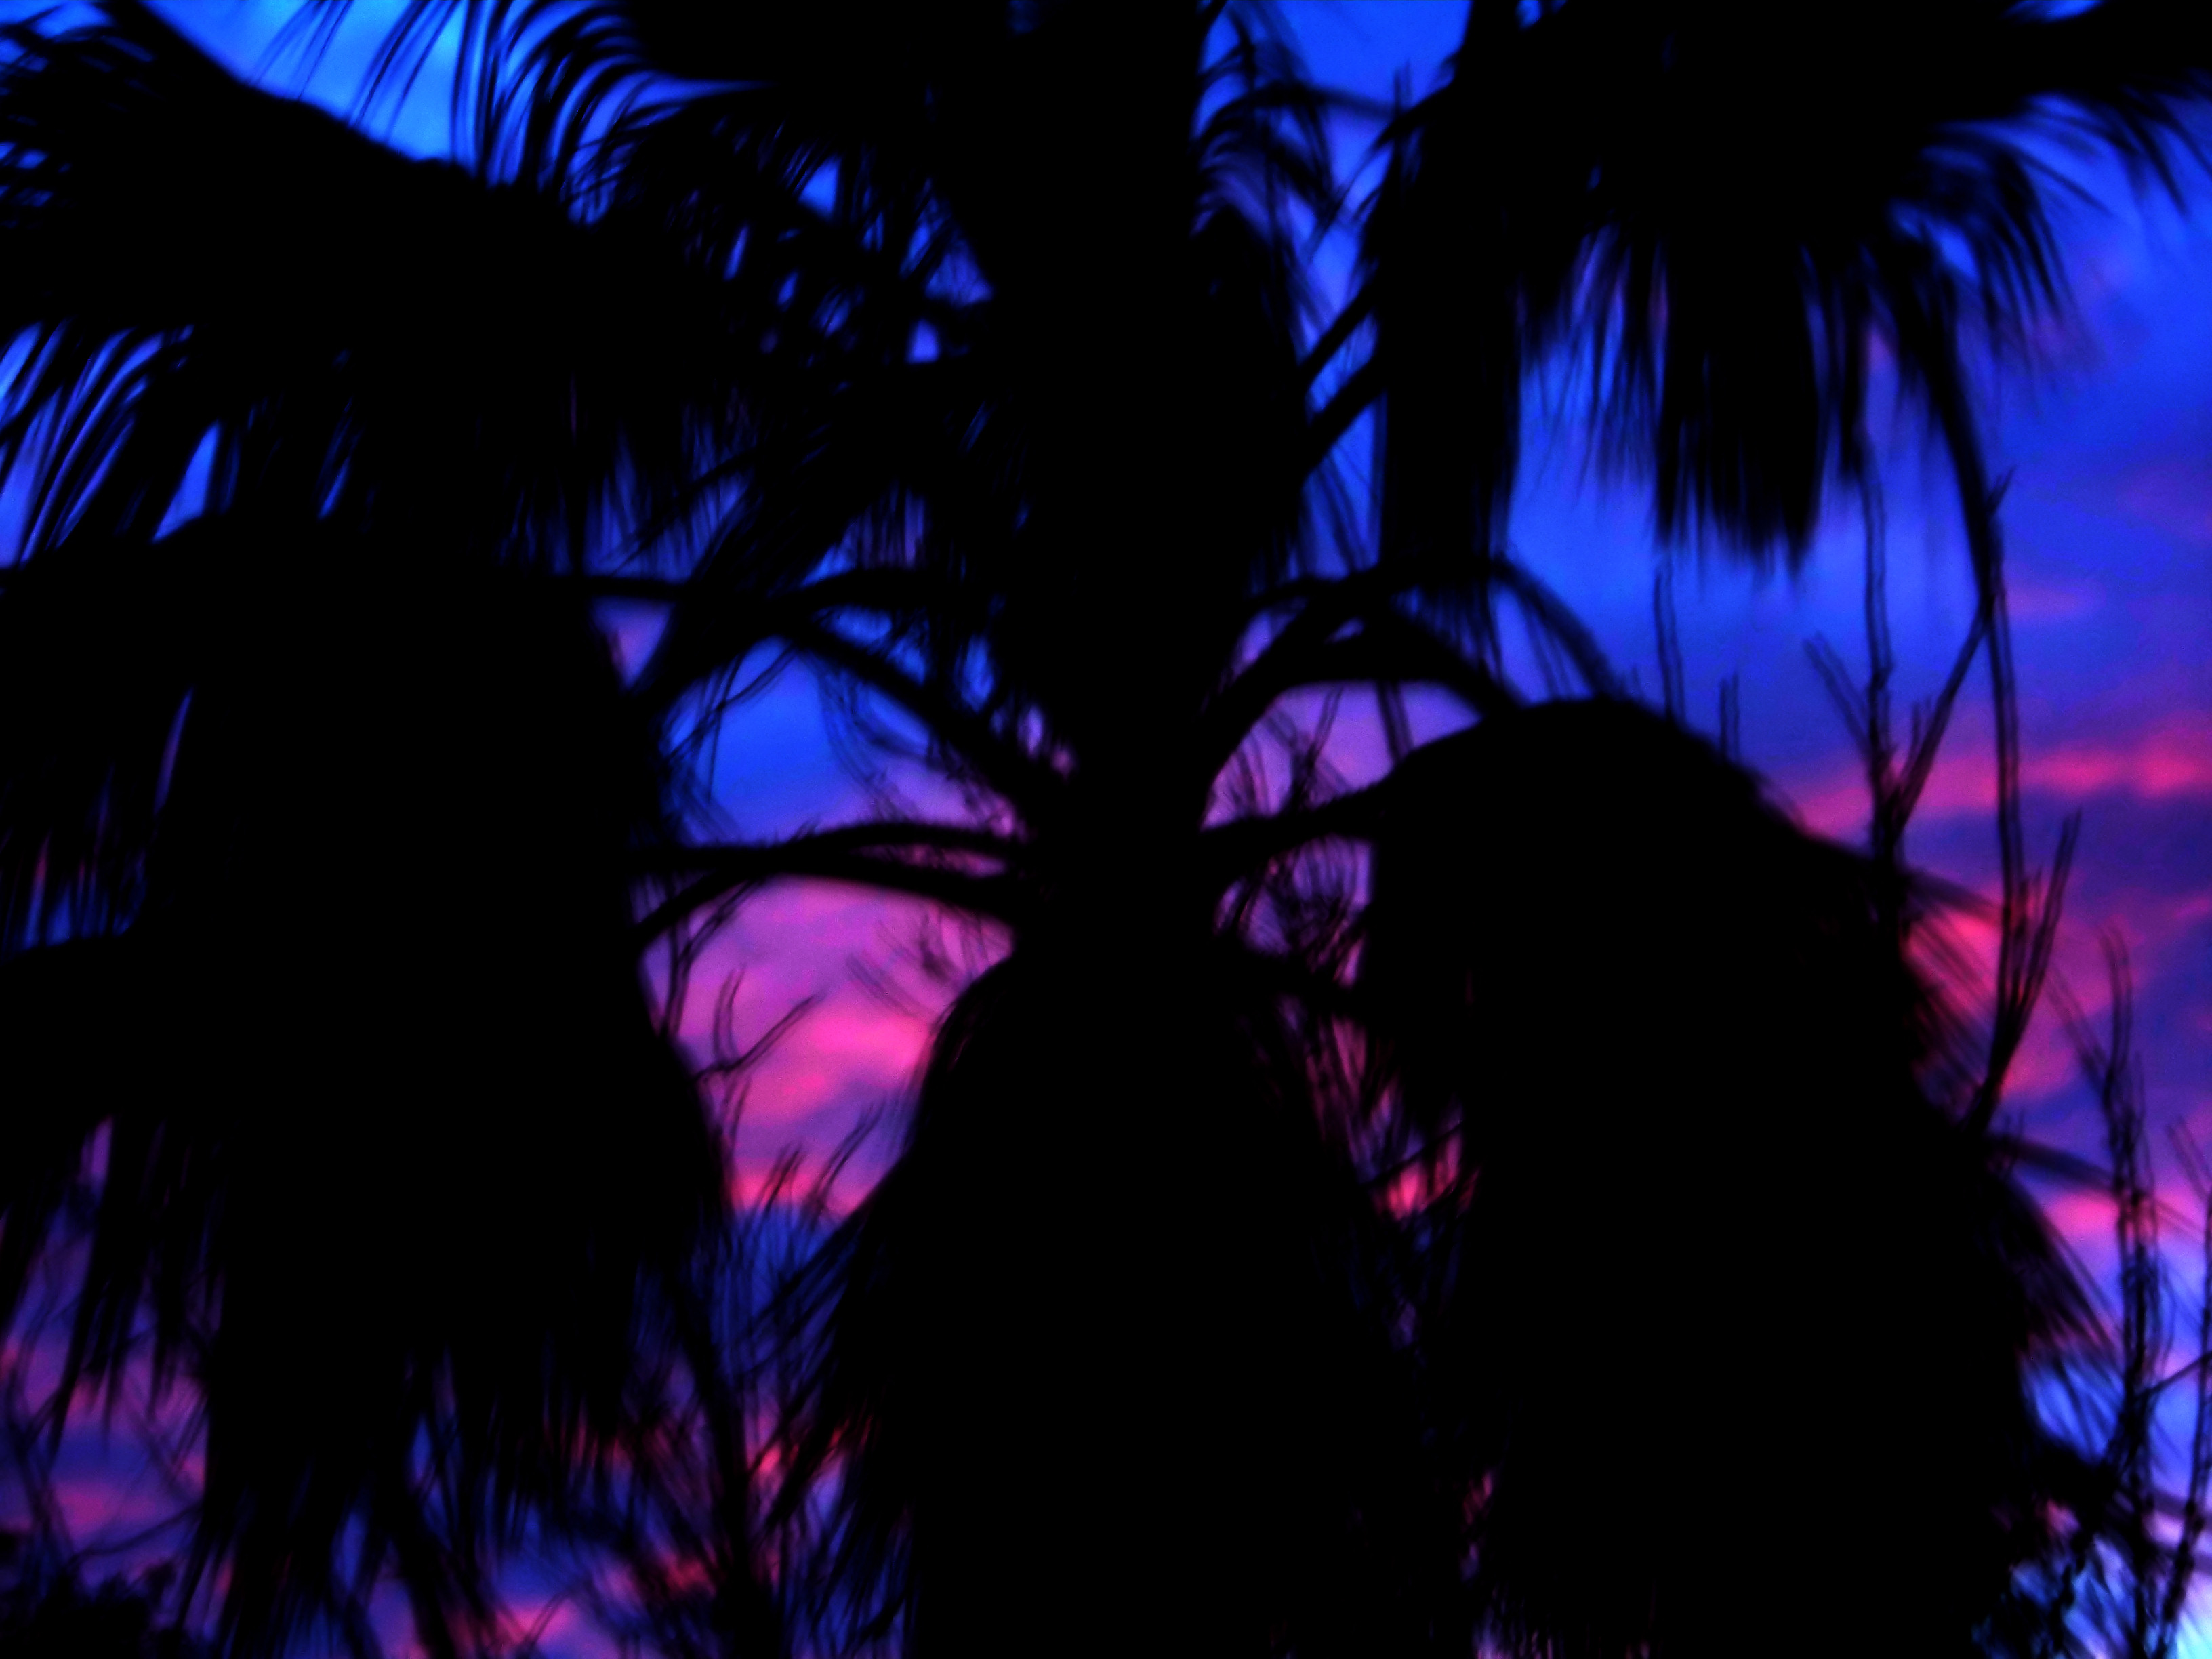 Palm sunset, Black, Blue, Dark, Magenta, HQ Photo